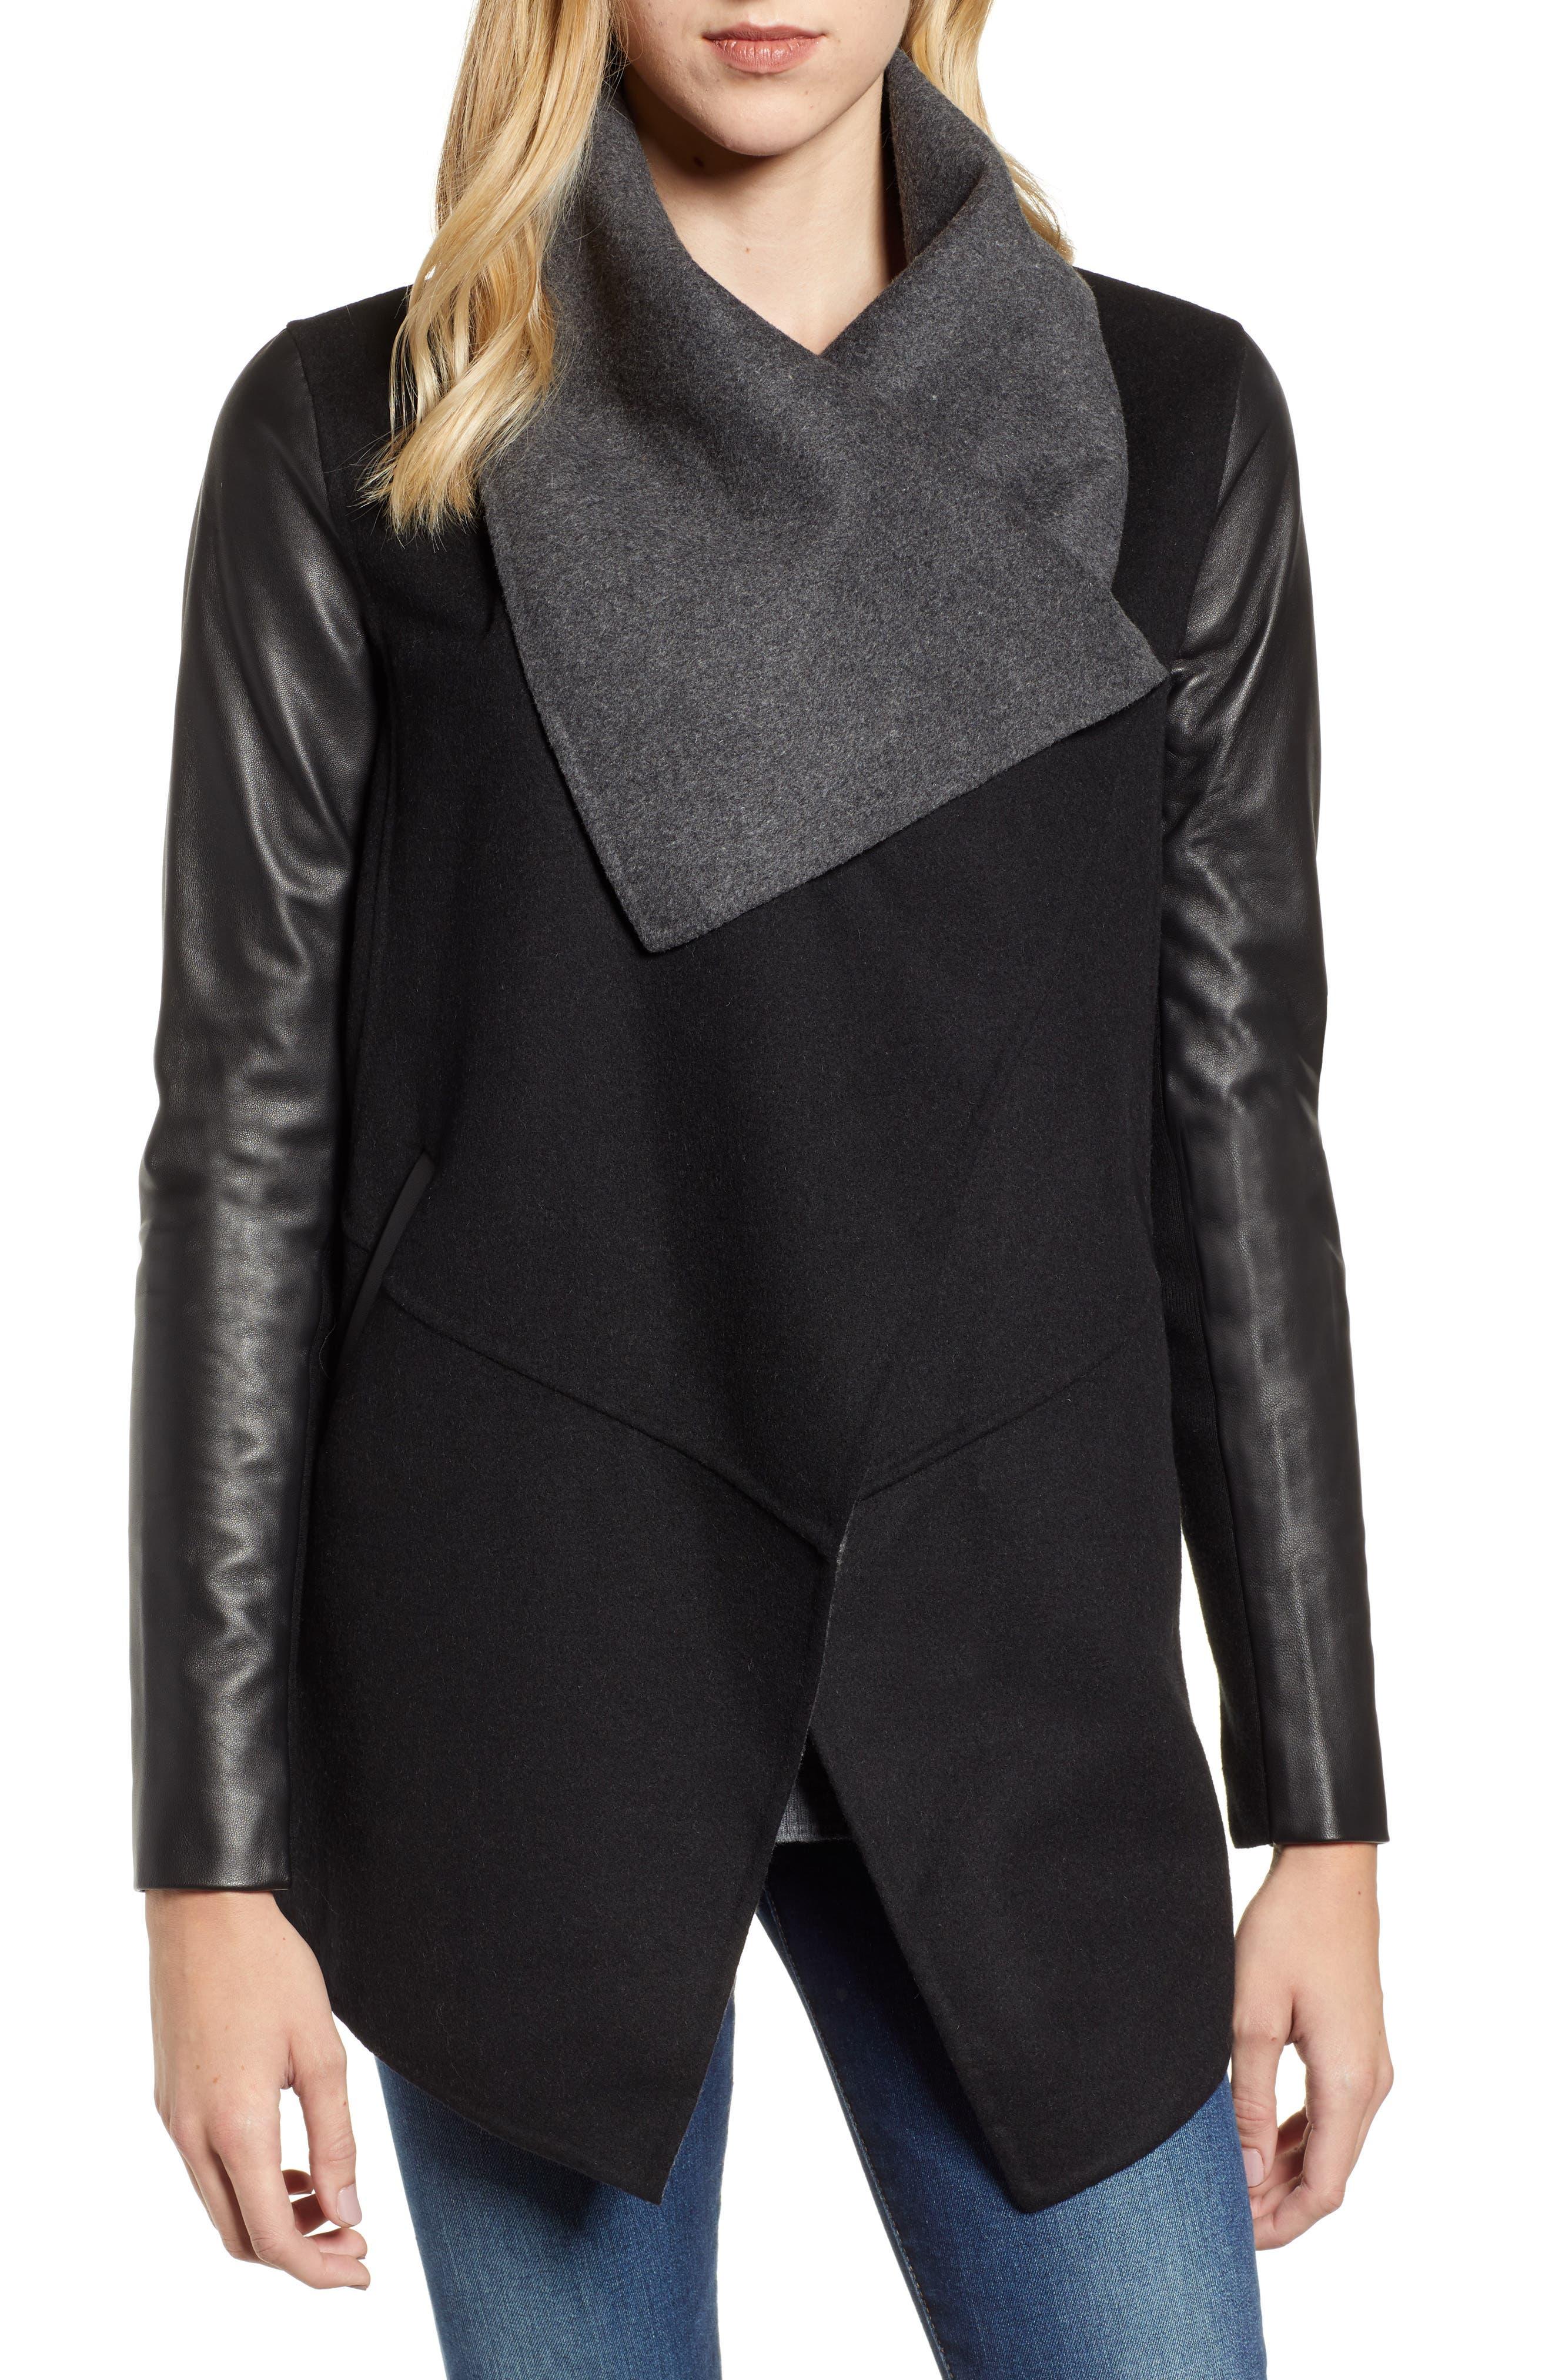 Vane Asymmetrical Leather Sleeve Coat,                             Alternate thumbnail 4, color,                             BLACK/ CHARCOAL